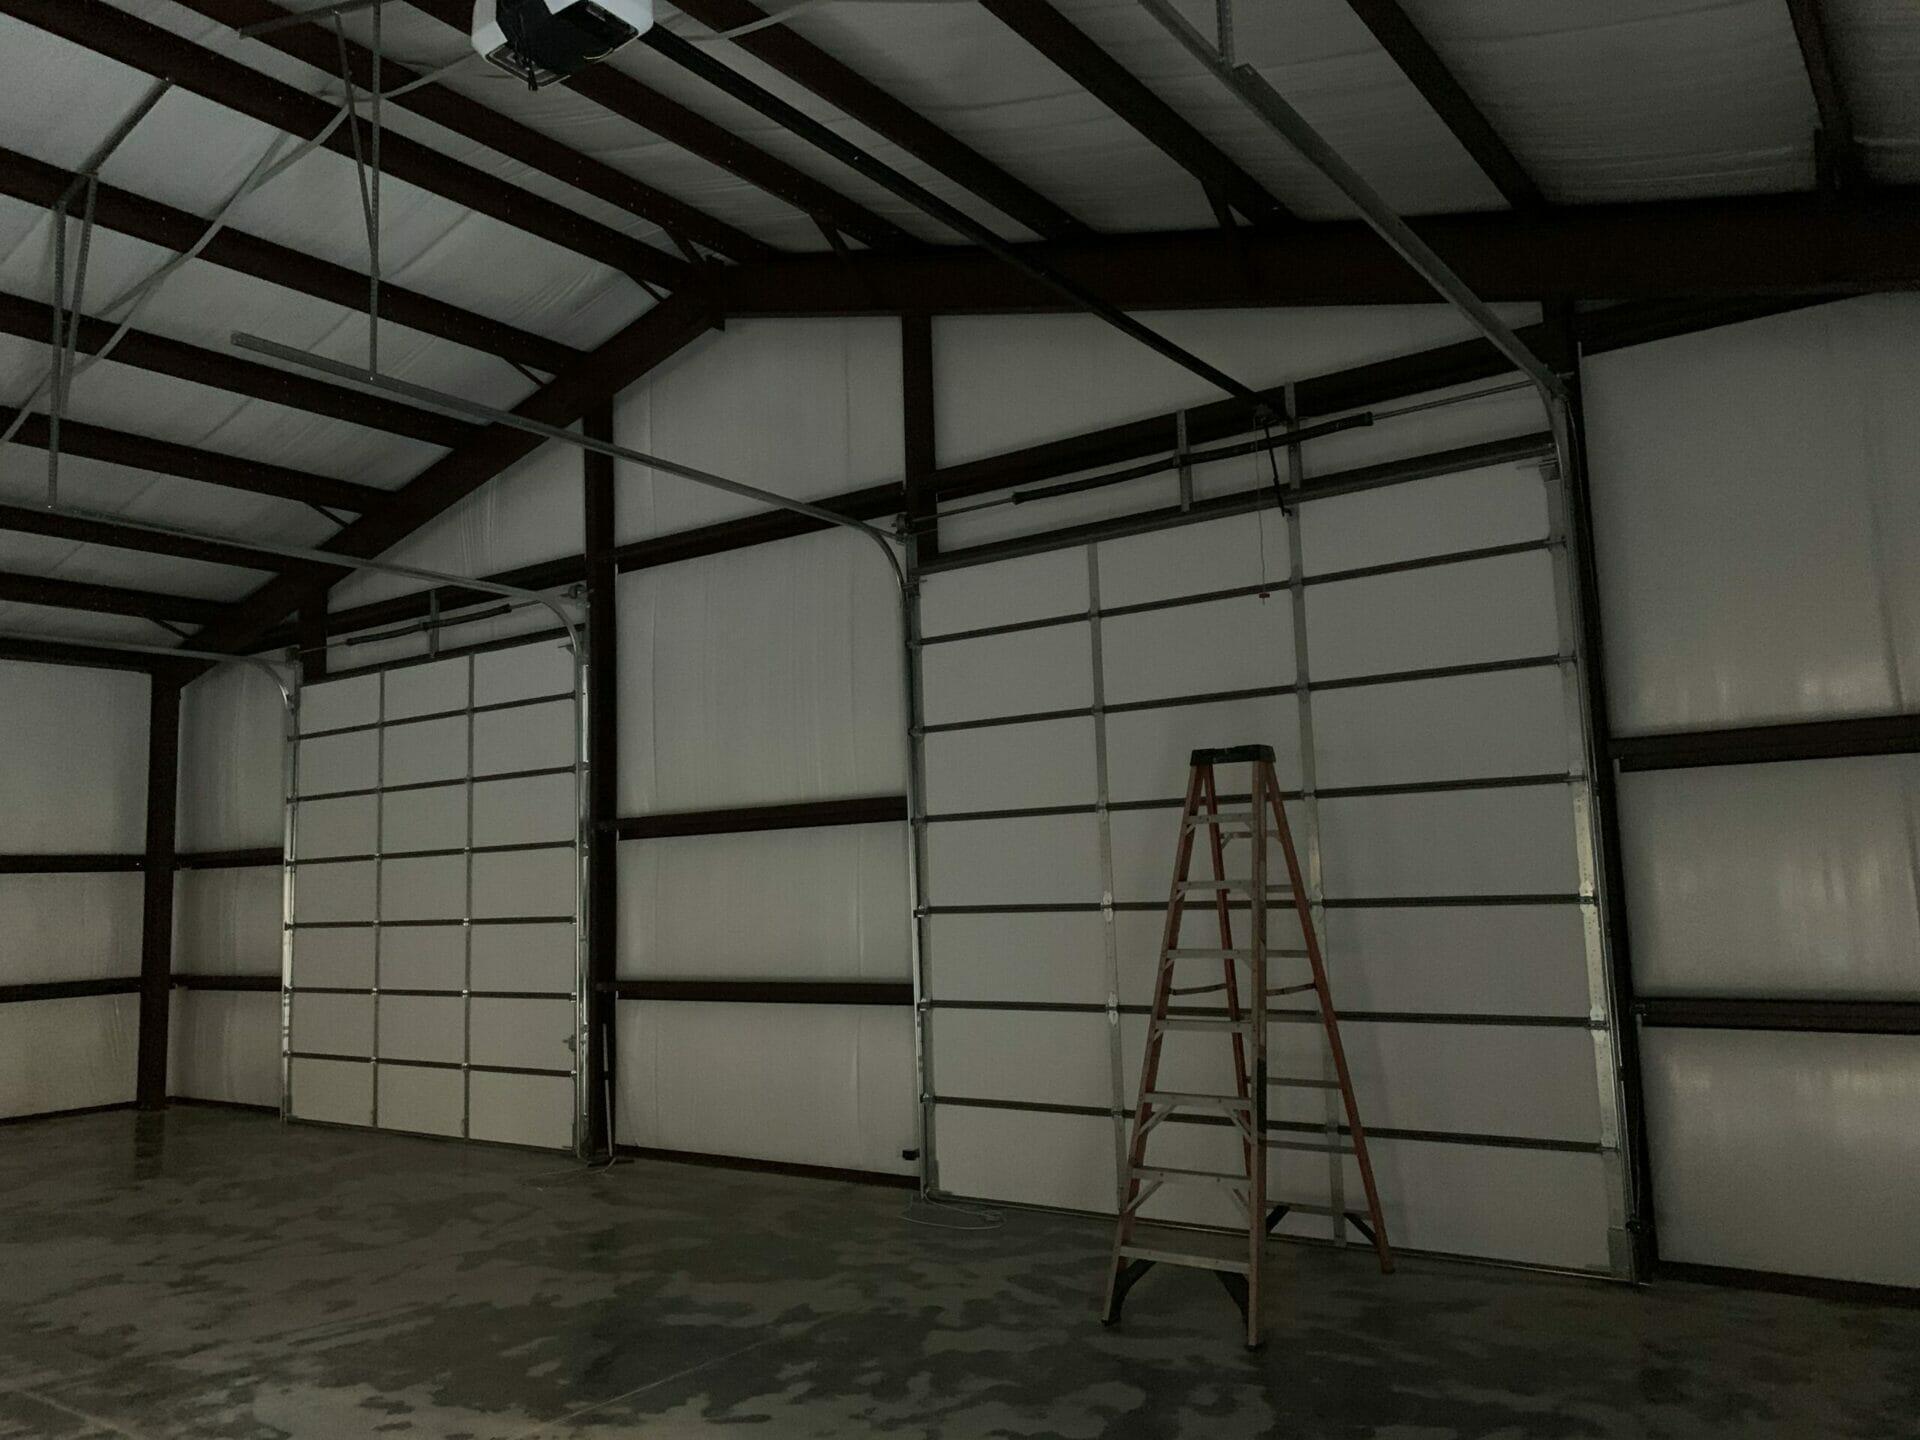 Interior View Of Pre-Engineered Metal 2 Car Garage Building With Roll Up Garage Doors